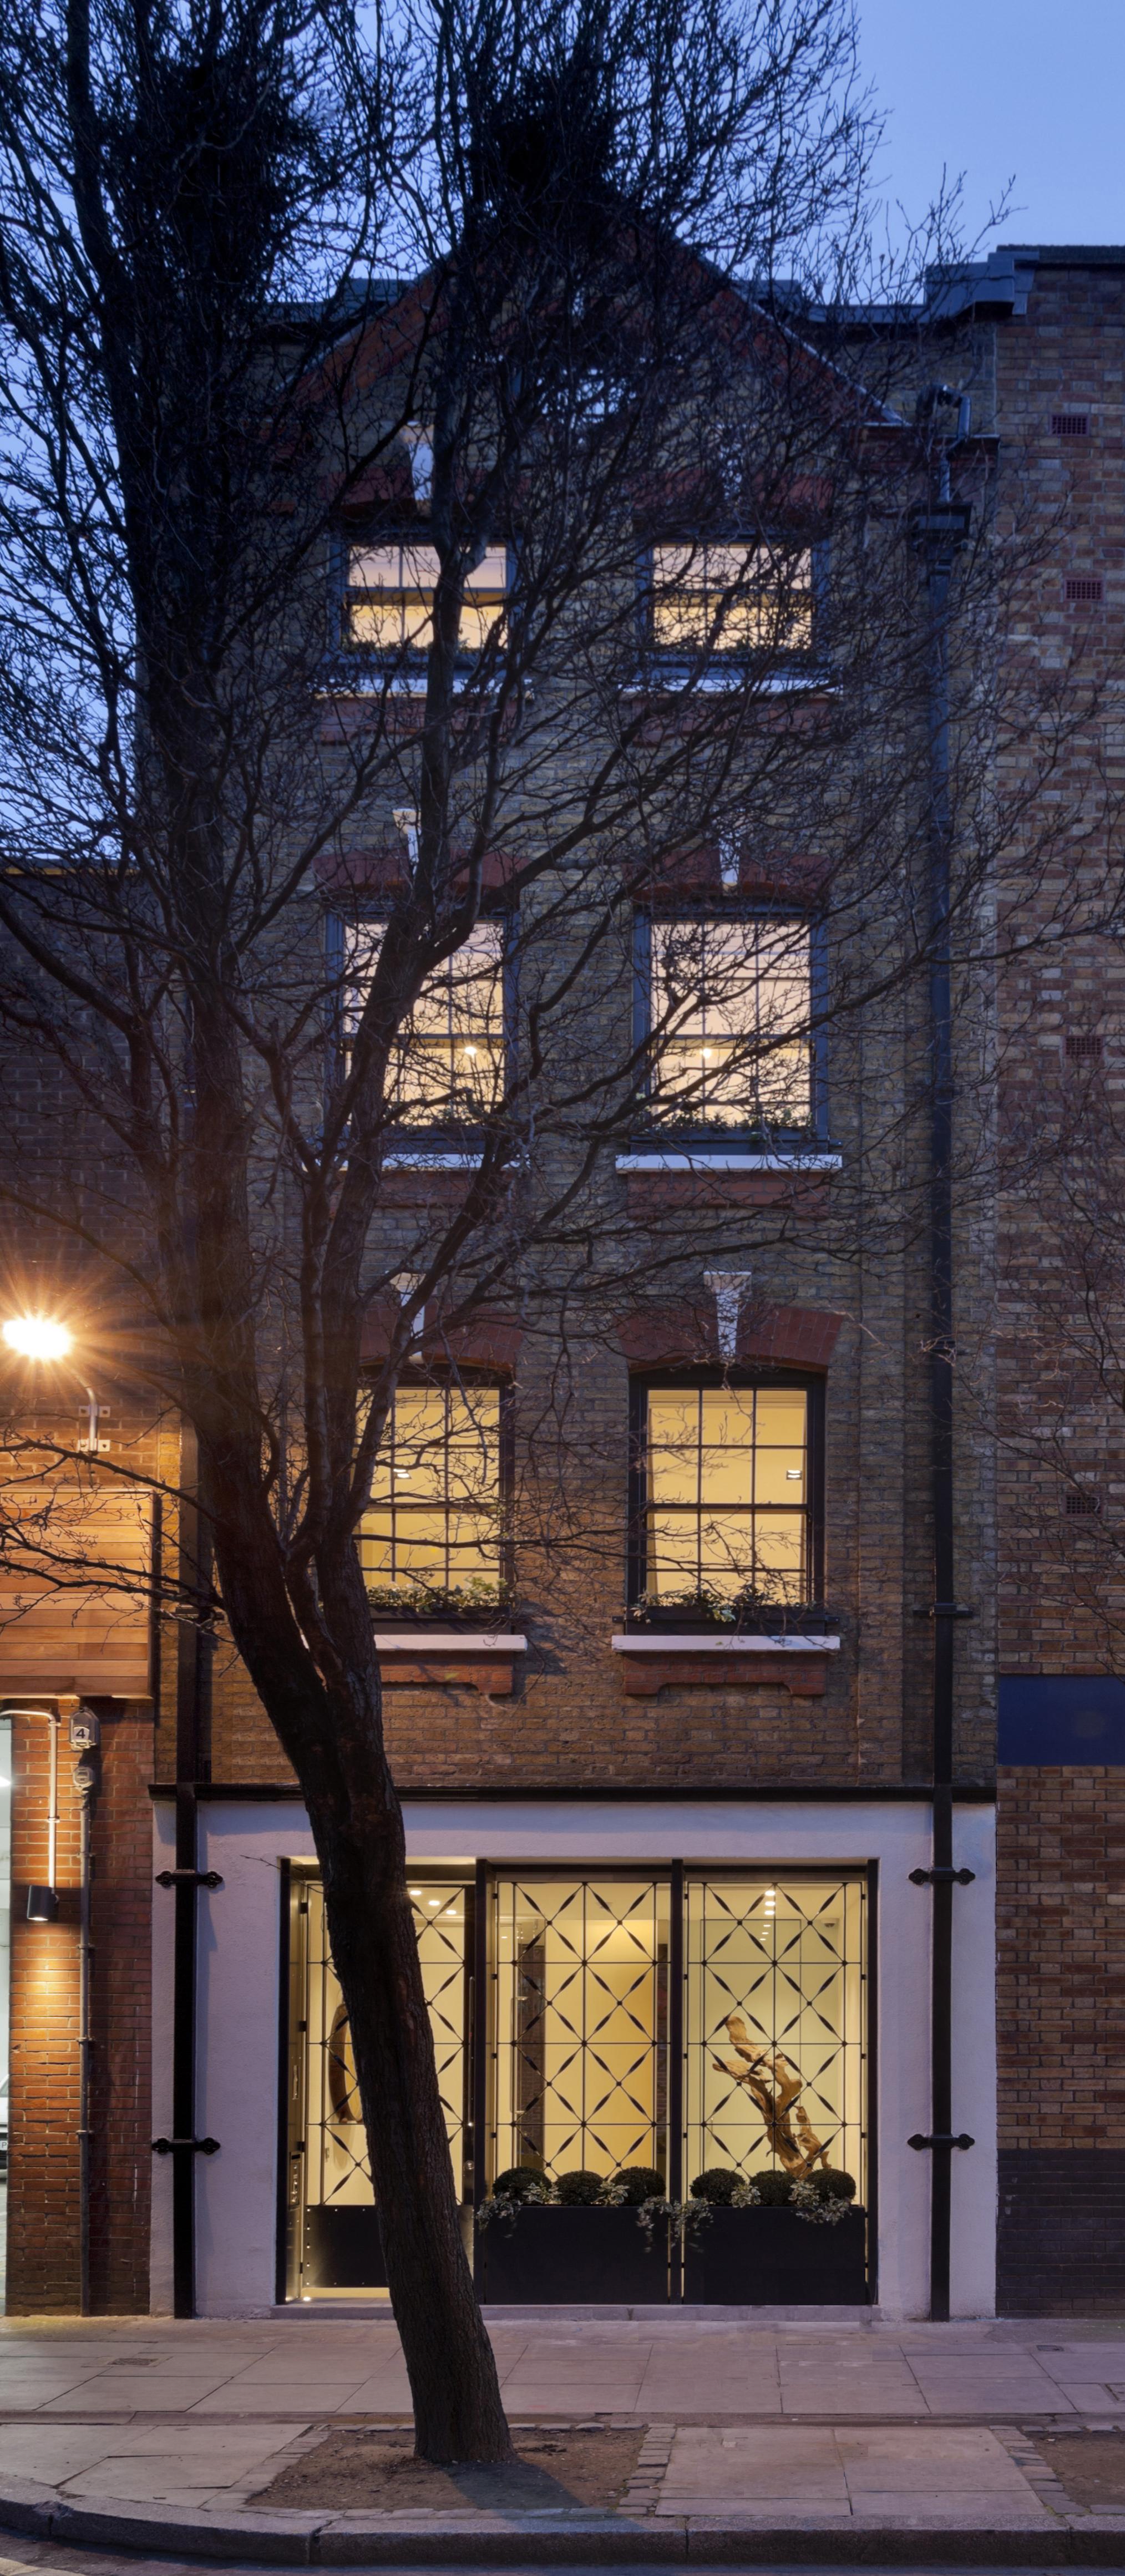 Copyright_Bruce_Hemming_NarrowHouse_exterior_night_shot.jpg